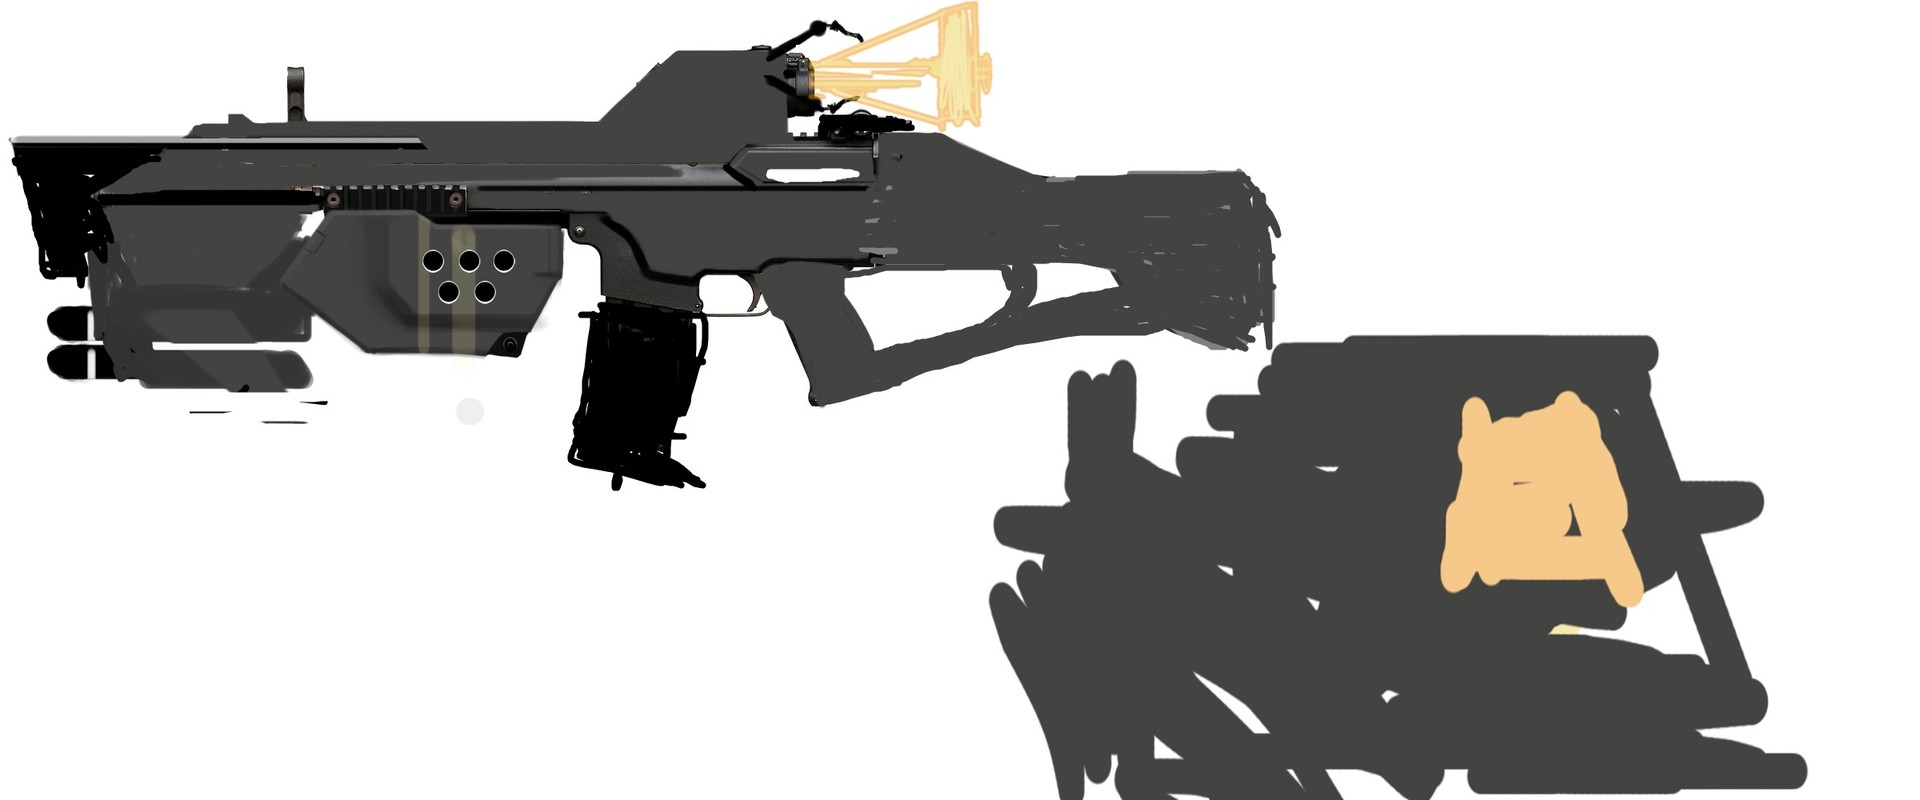 Pongstah leonardo go ii weapon002 wipconcept 003